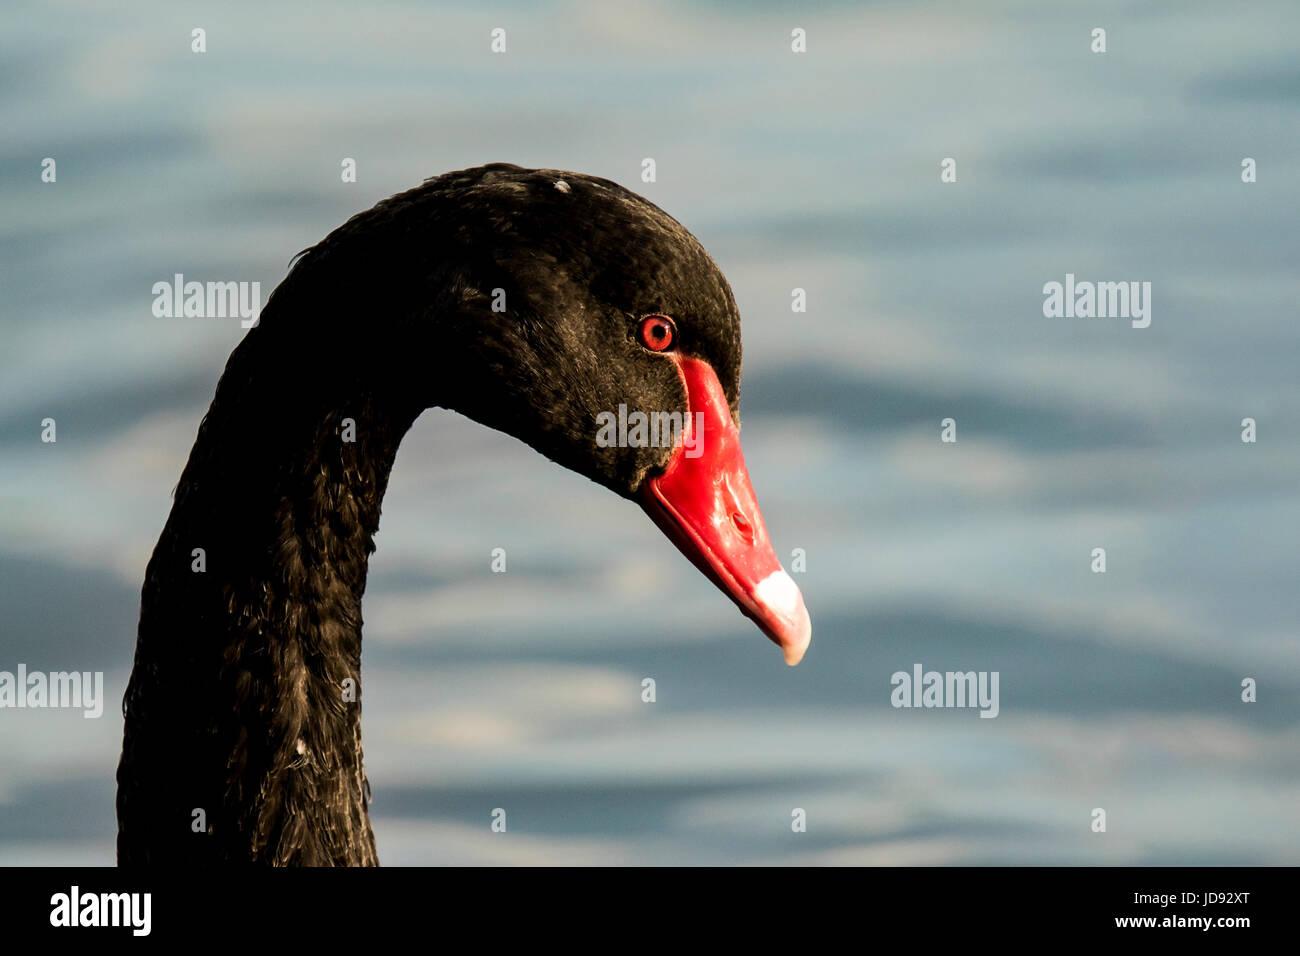 A Portrait of a Black Swan in Co. Dublin - Stock Image